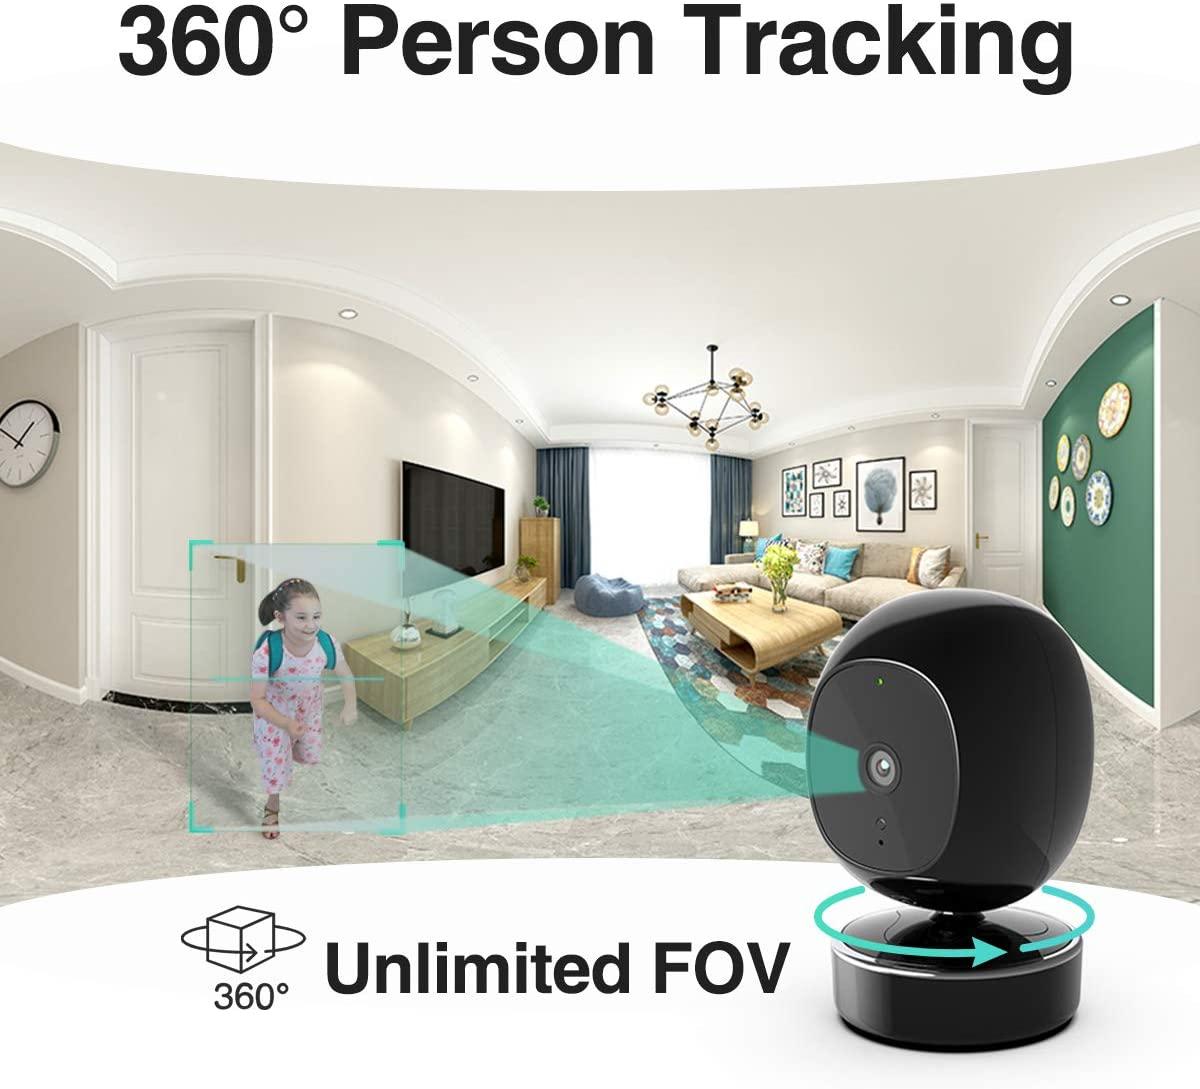 SimCam 1S AI Home Security Camera degree of view